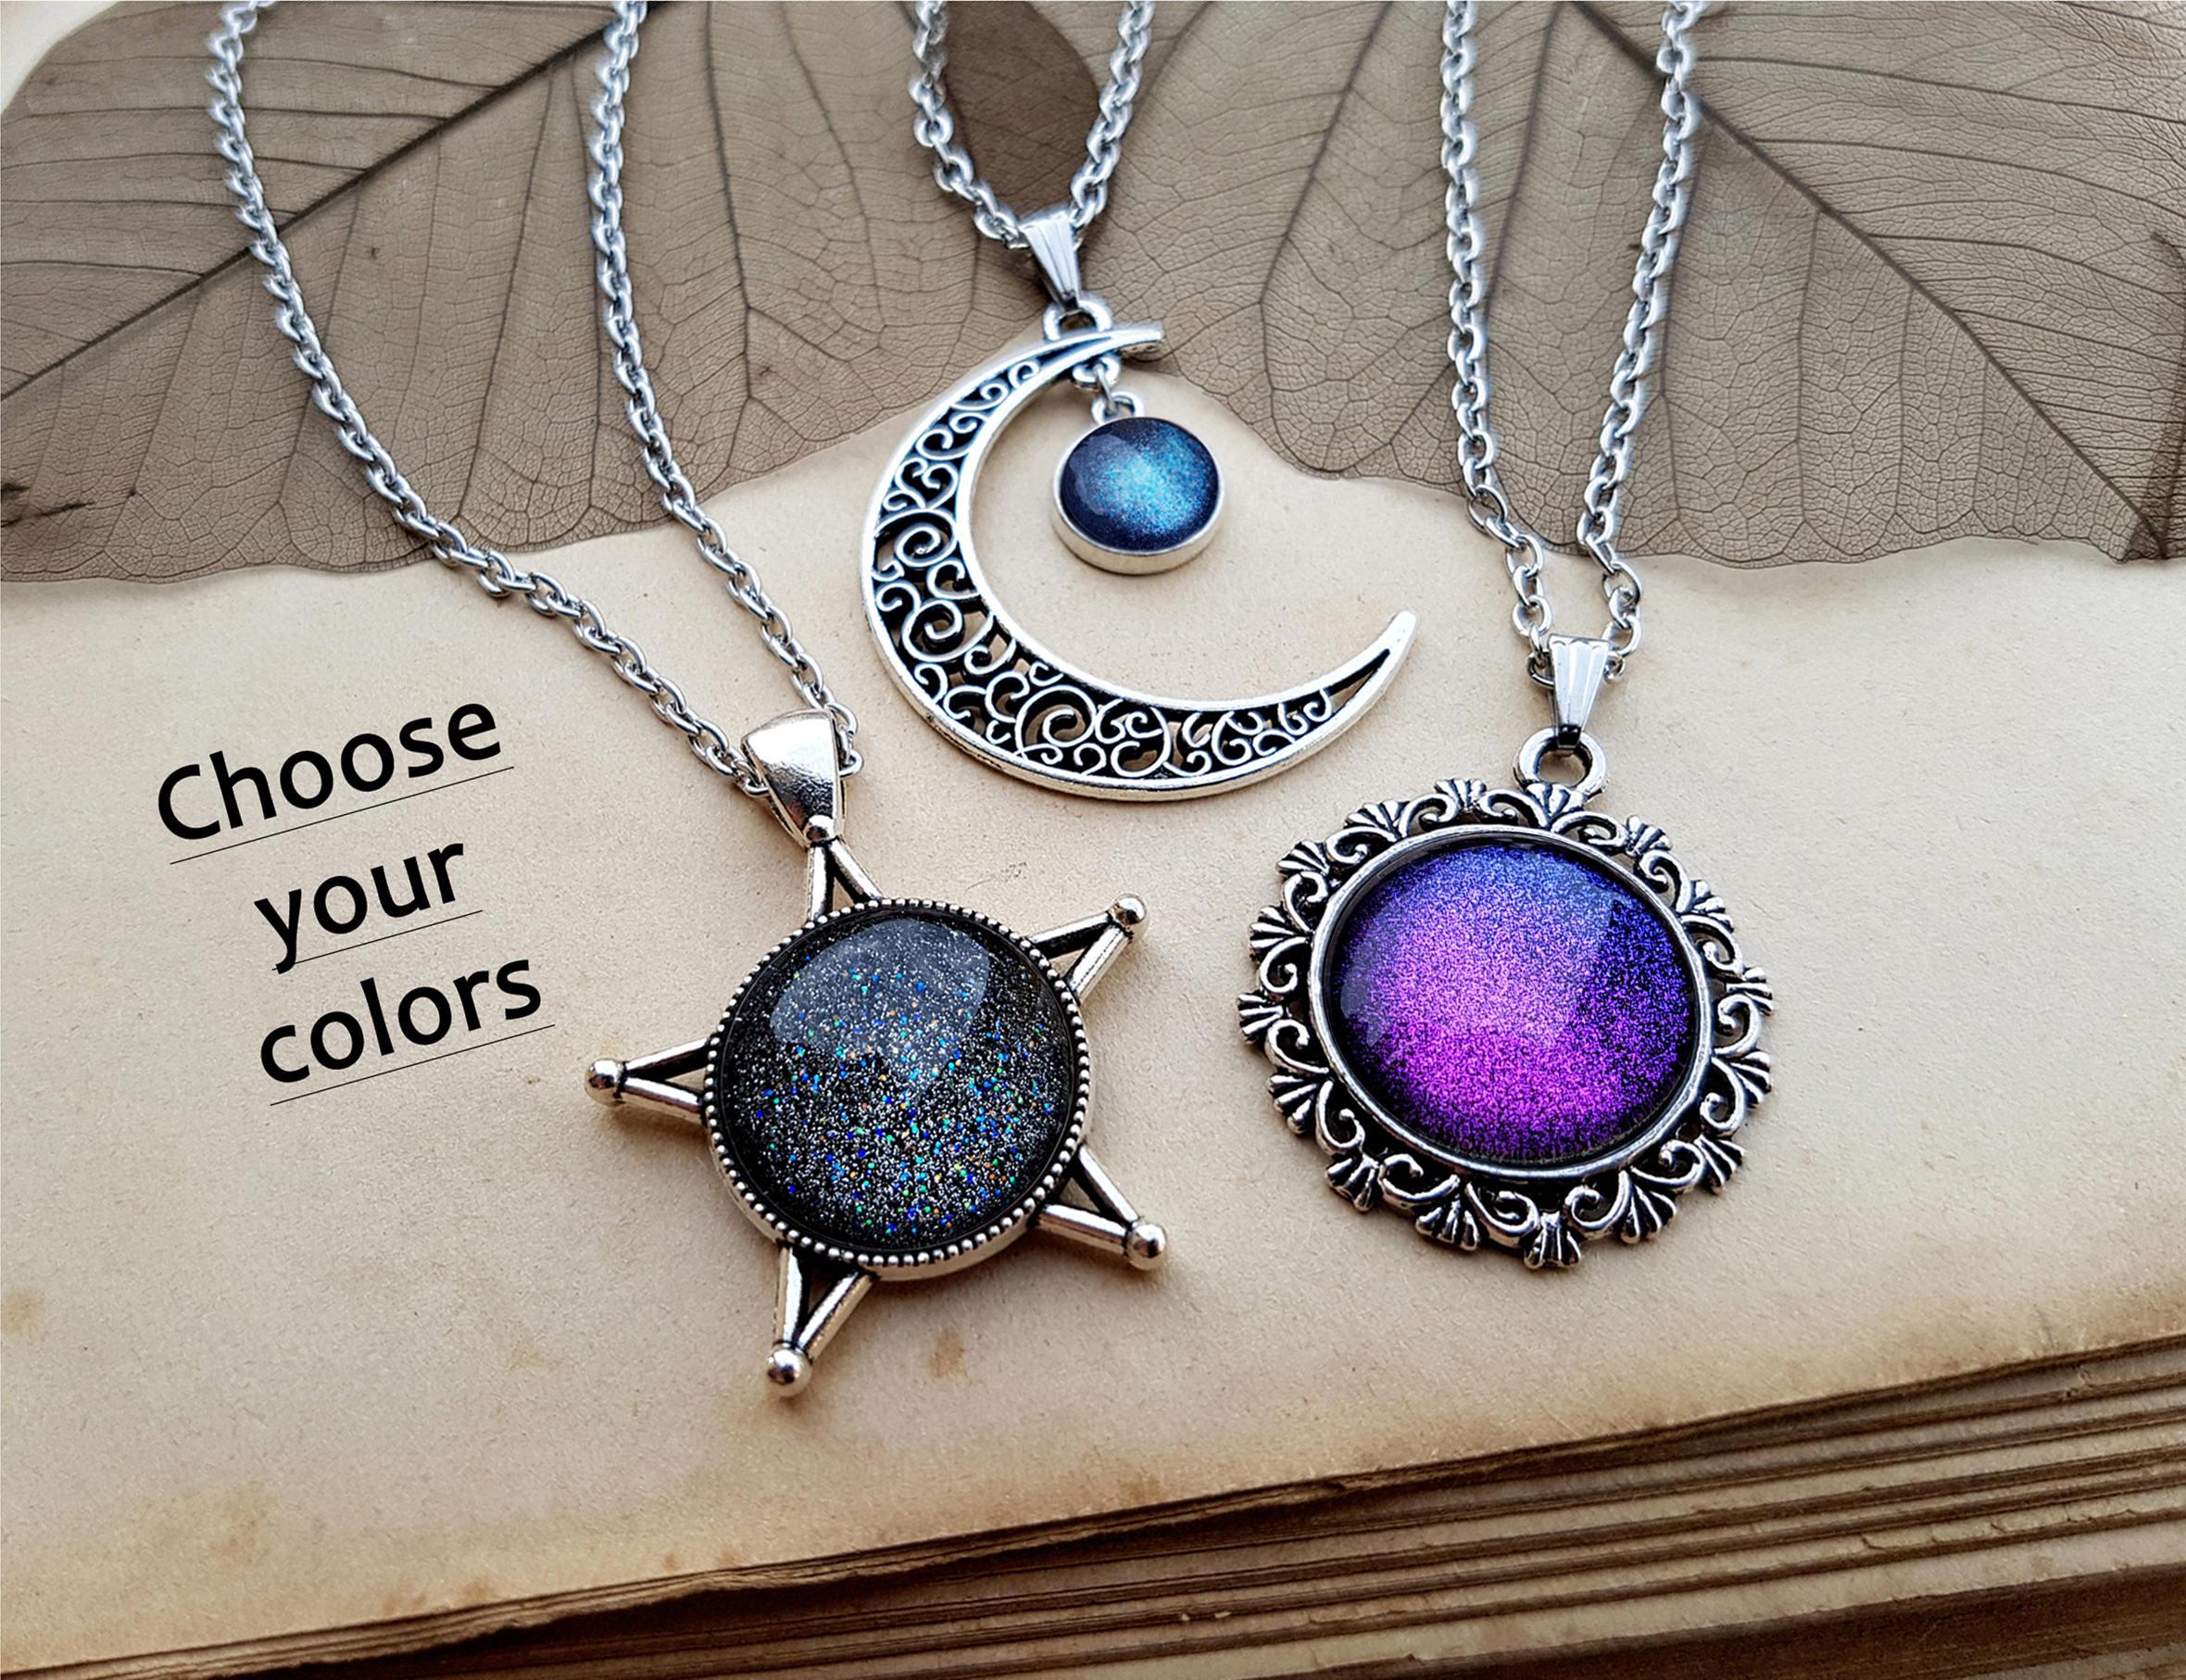 3 Sun Moon Star Necklaces best friends jewelry friendship ...